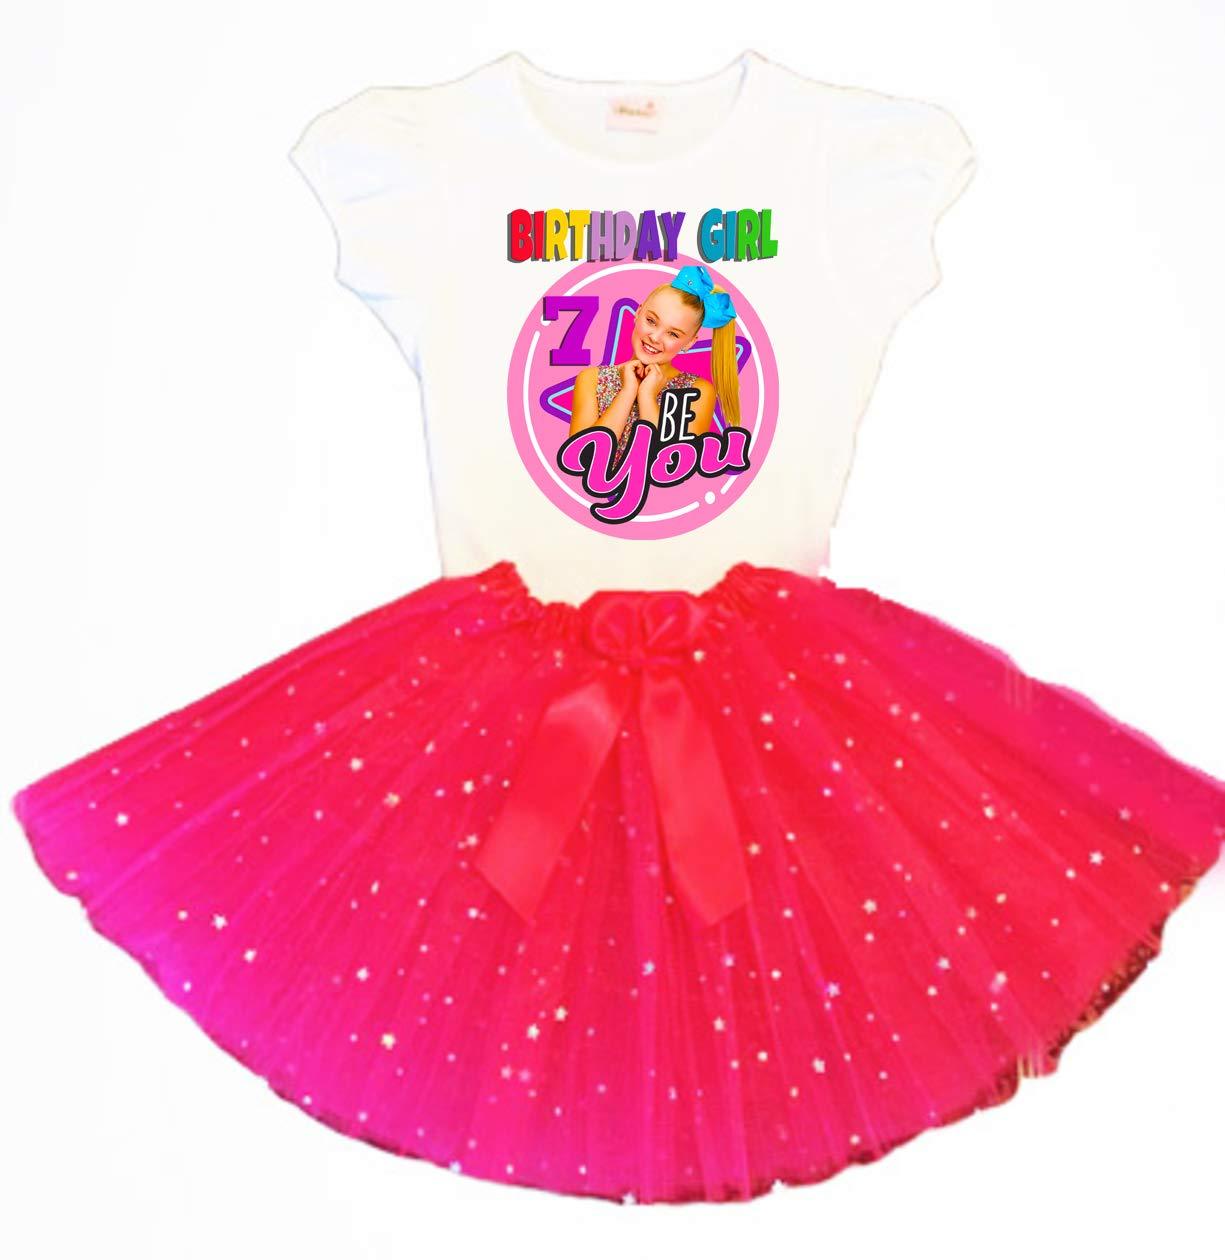 JoJo Birthday Tutu 7th Dealing full price reduction Fuchsia Outfit Dress Party 4 years warranty